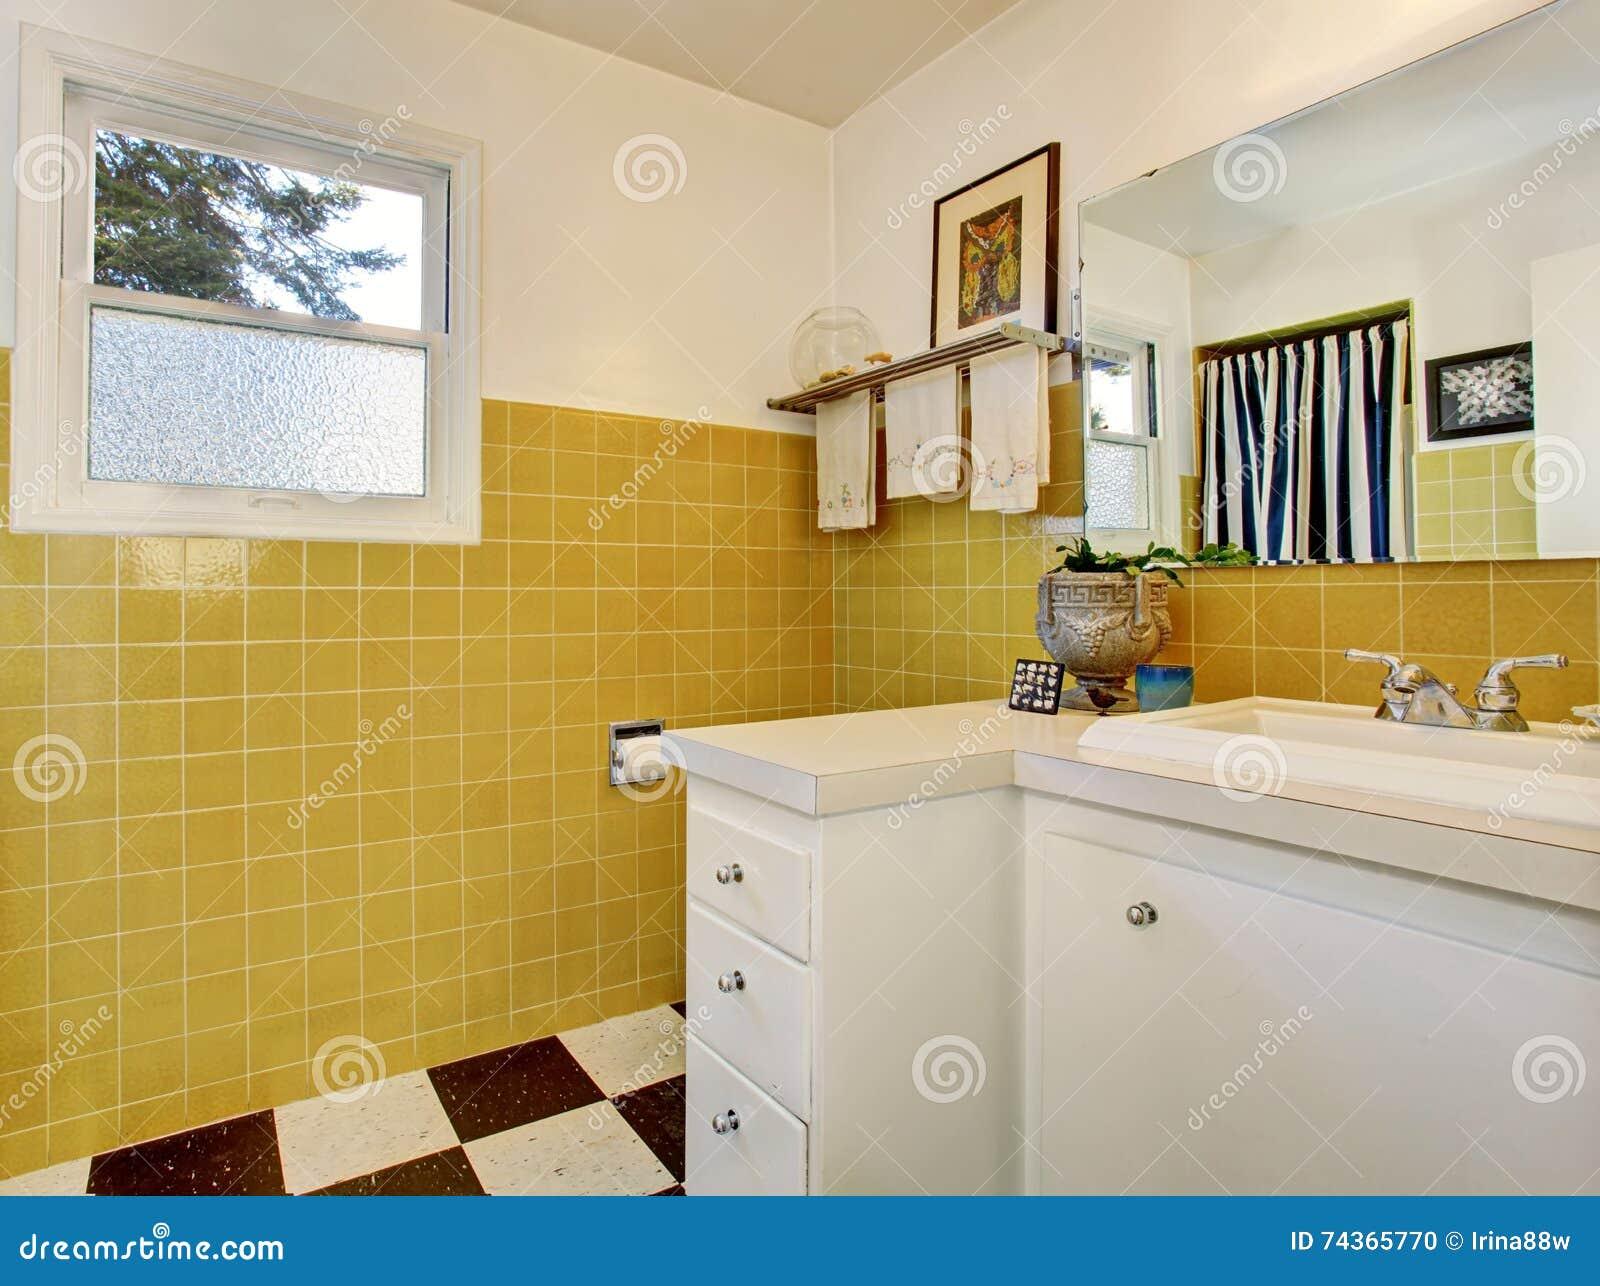 Pareti gialle colorato pareti with pareti gialle pareti - Dipingere piastrelle bagno ...